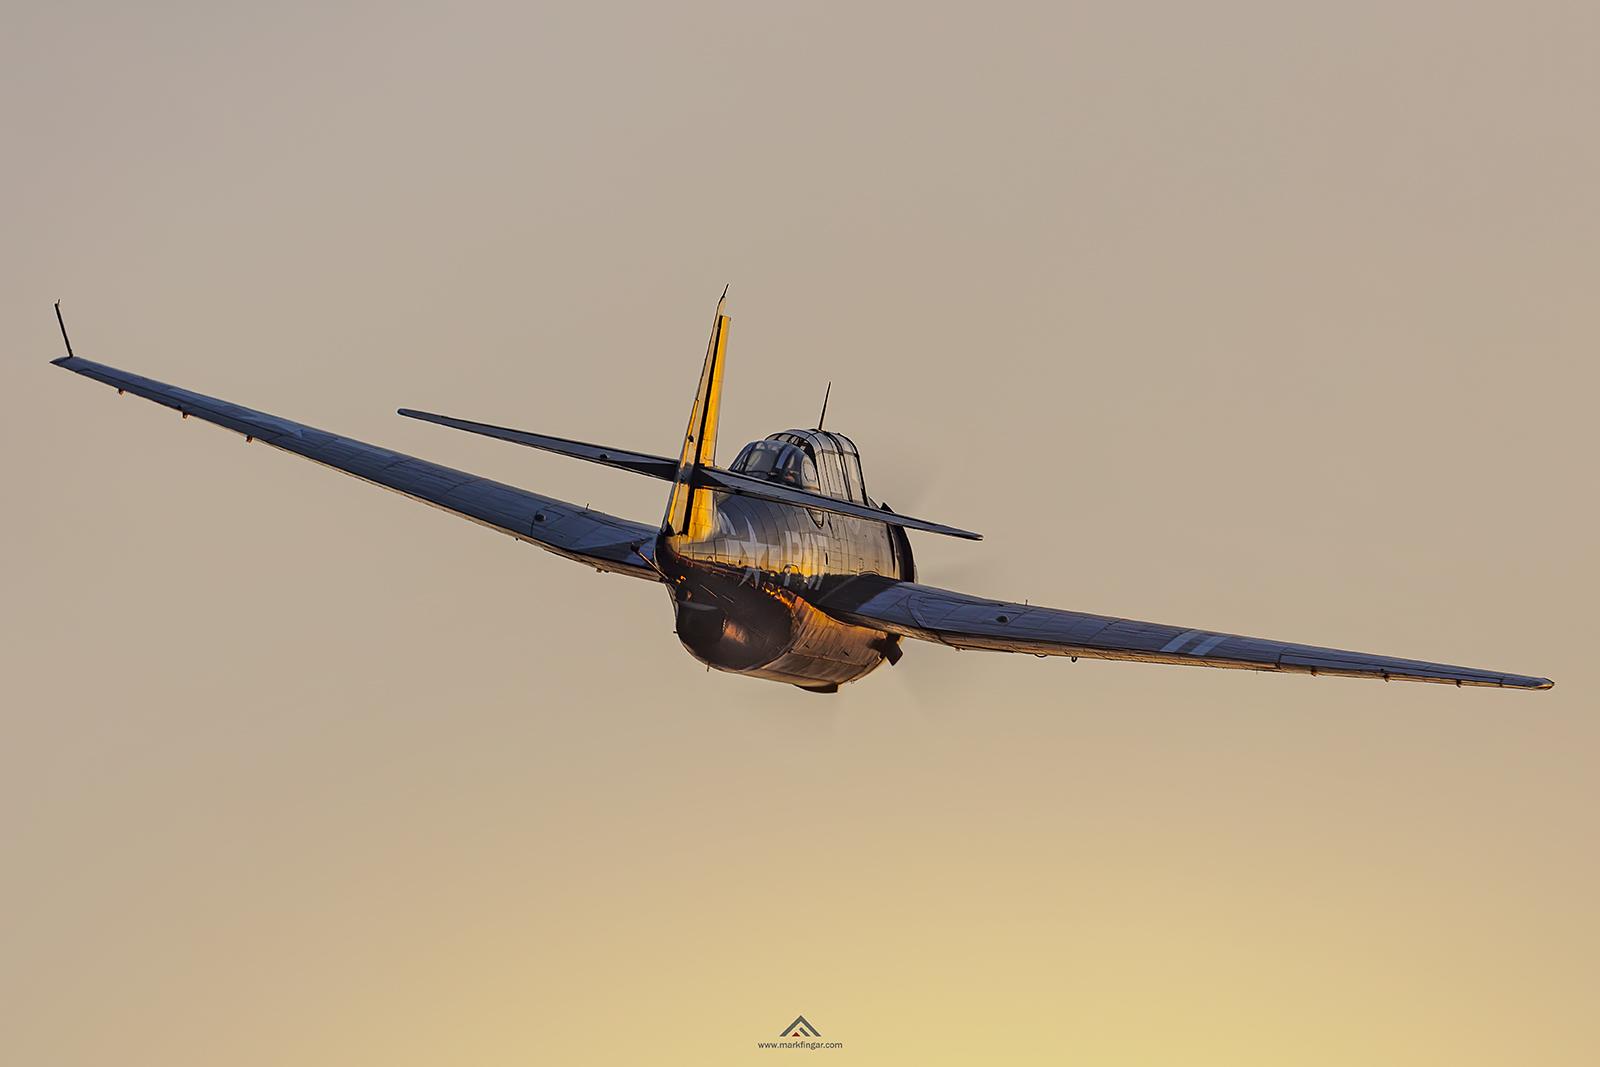 IMAGE: http://markfingar.com/photogallery/Aircraft/Proms_2017/283A4609lr.jpg